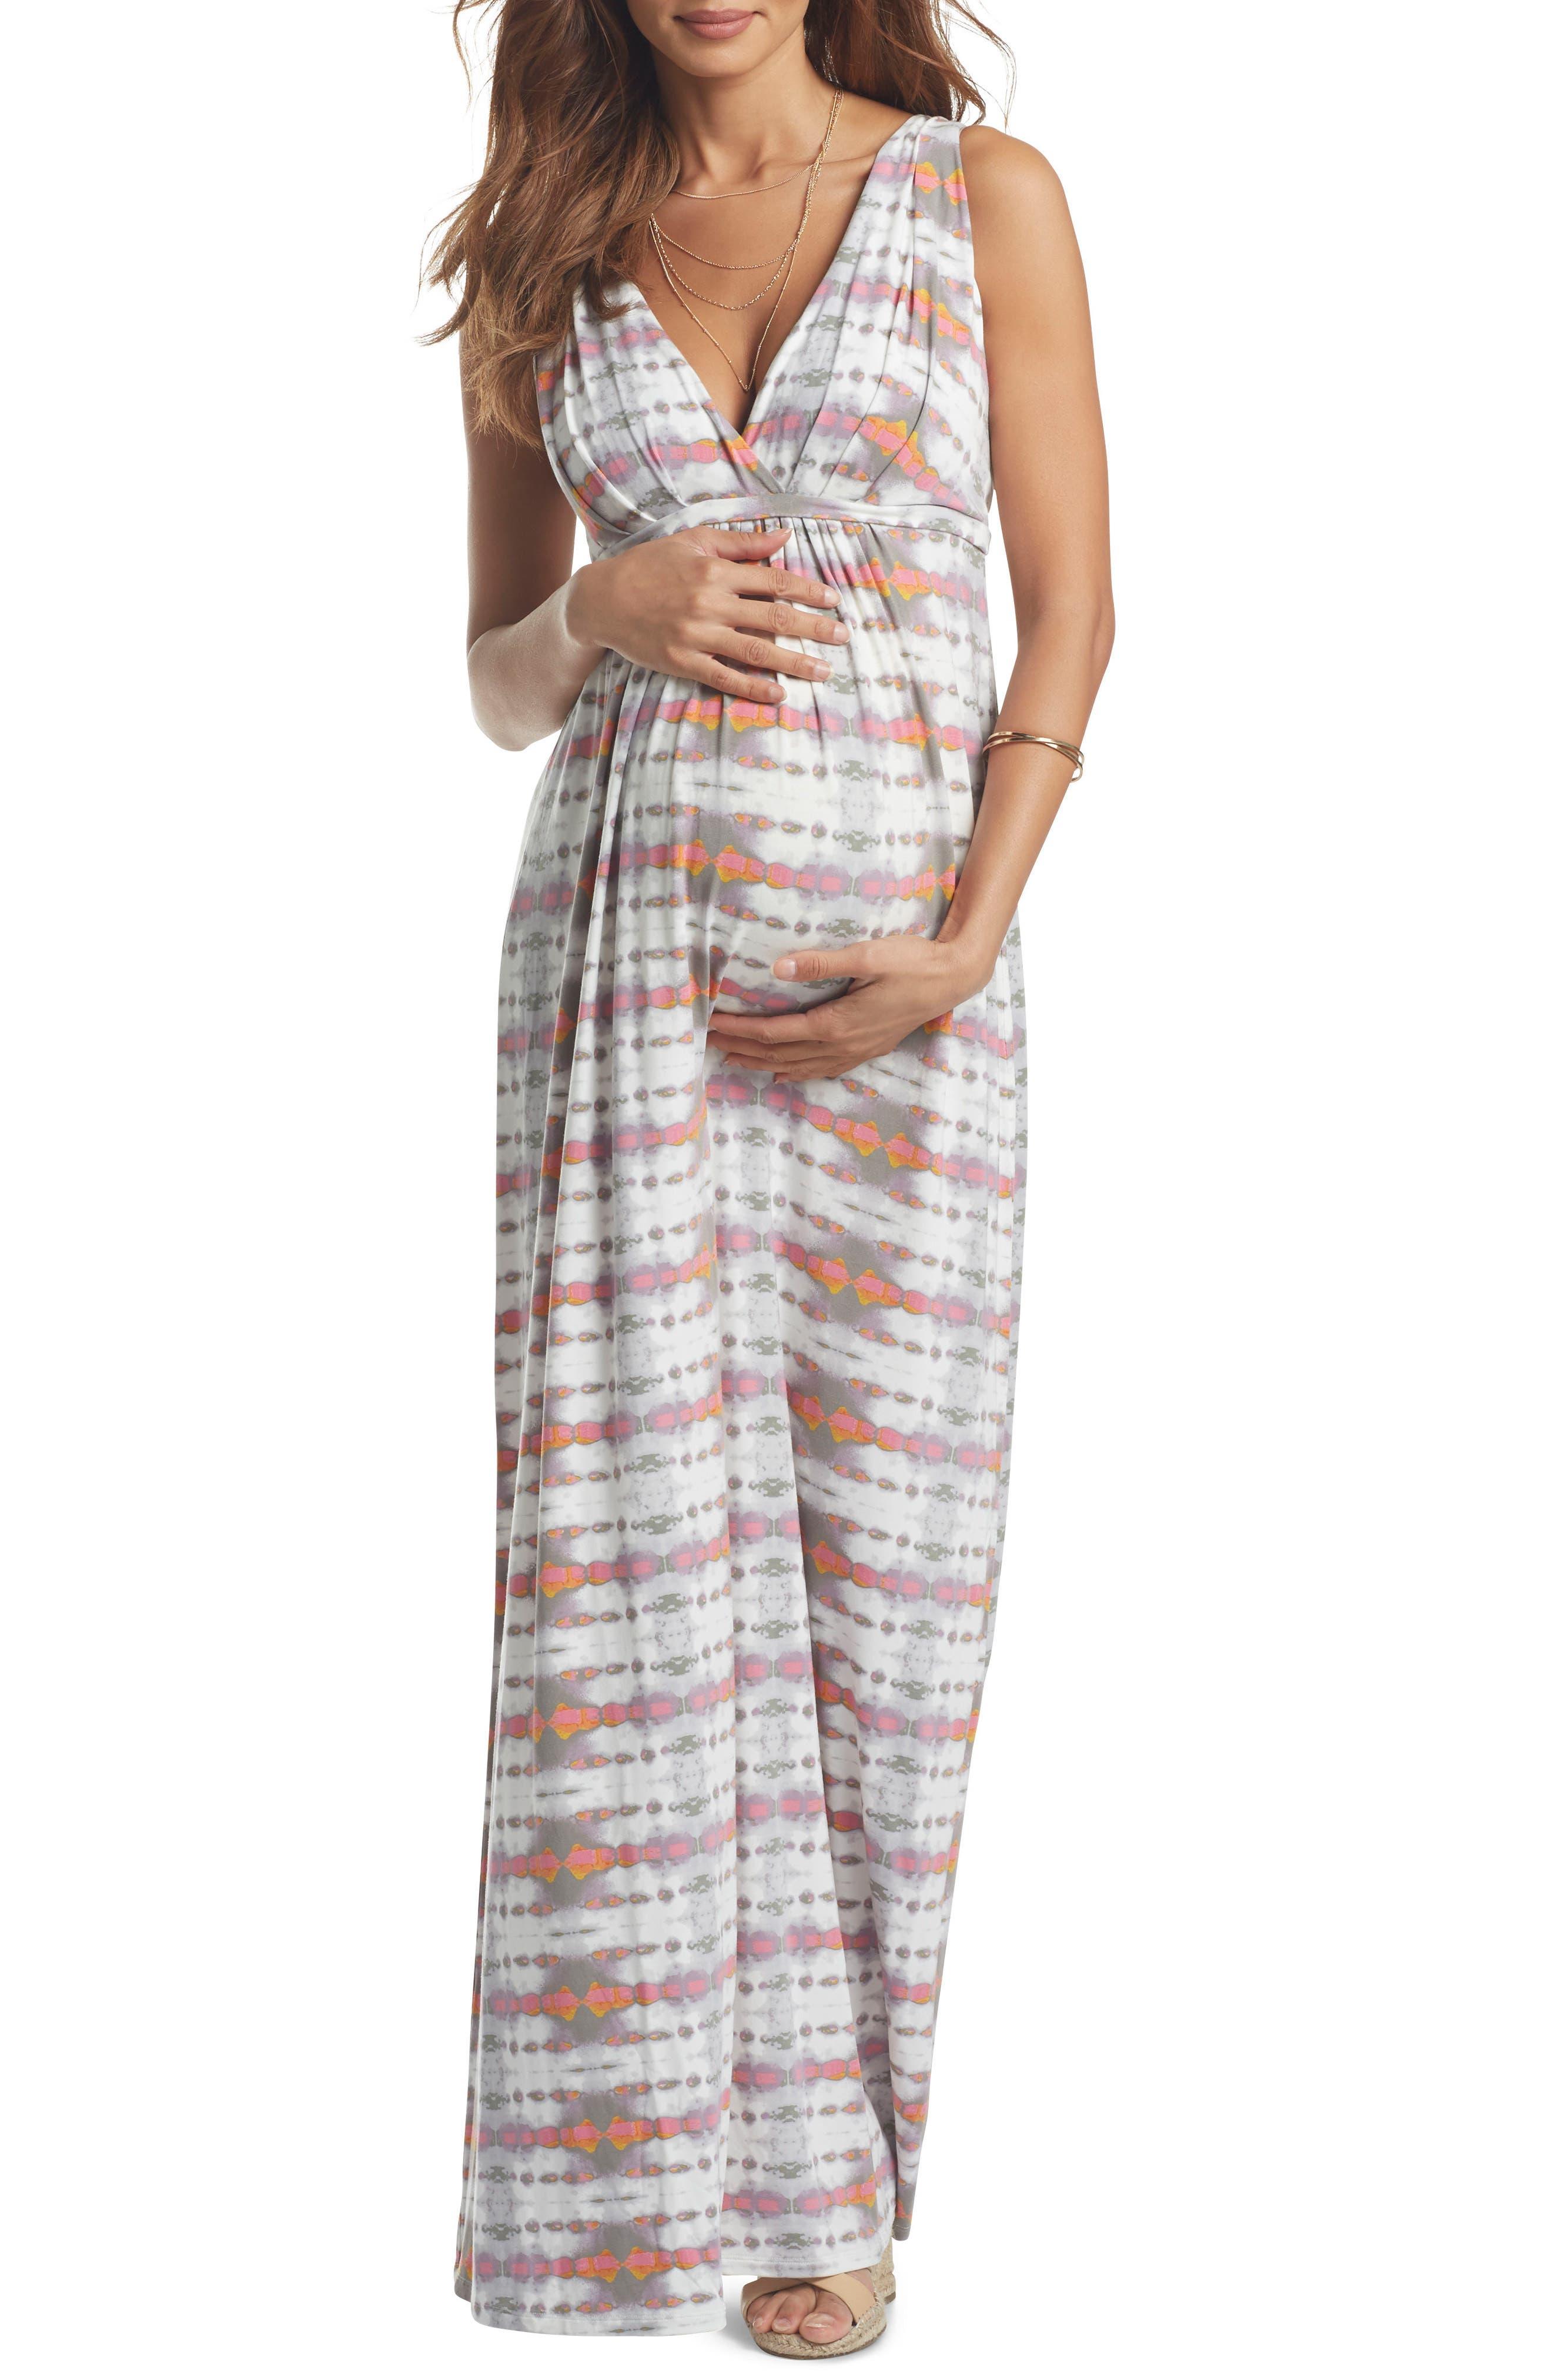 TART MATERNITY Chloe Maternity Maxi Dress